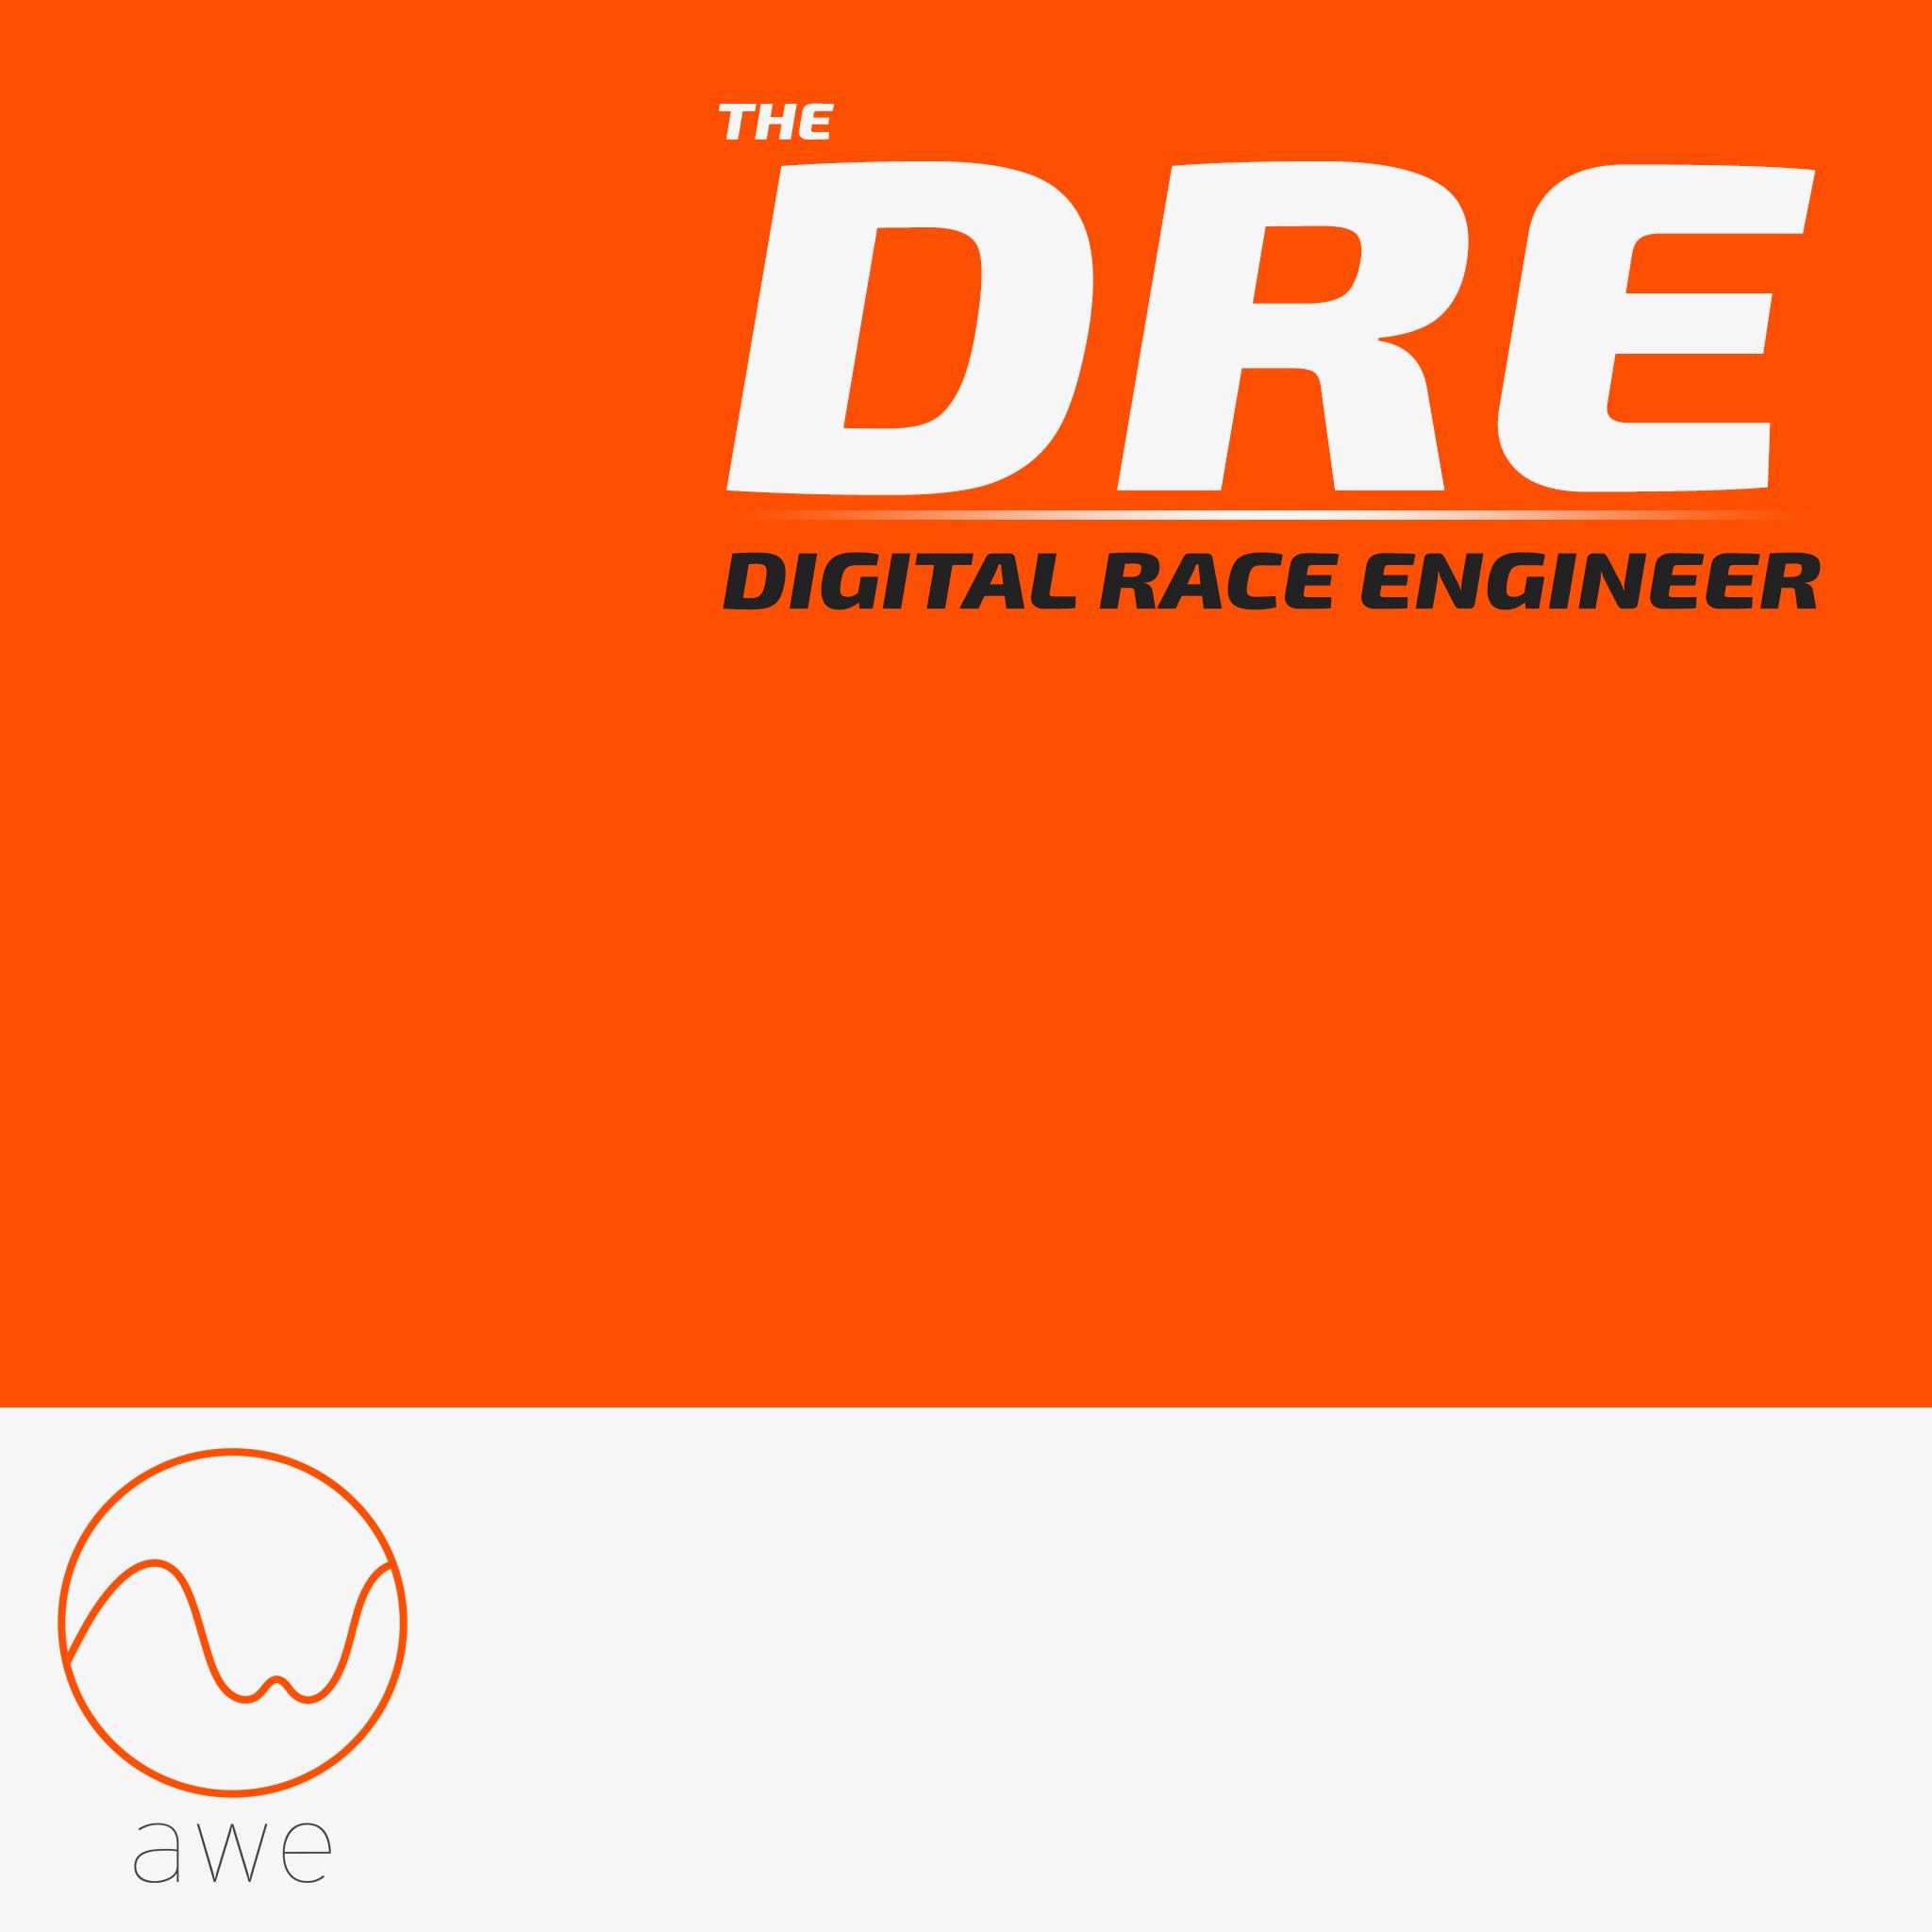 The Digital Race Engineer